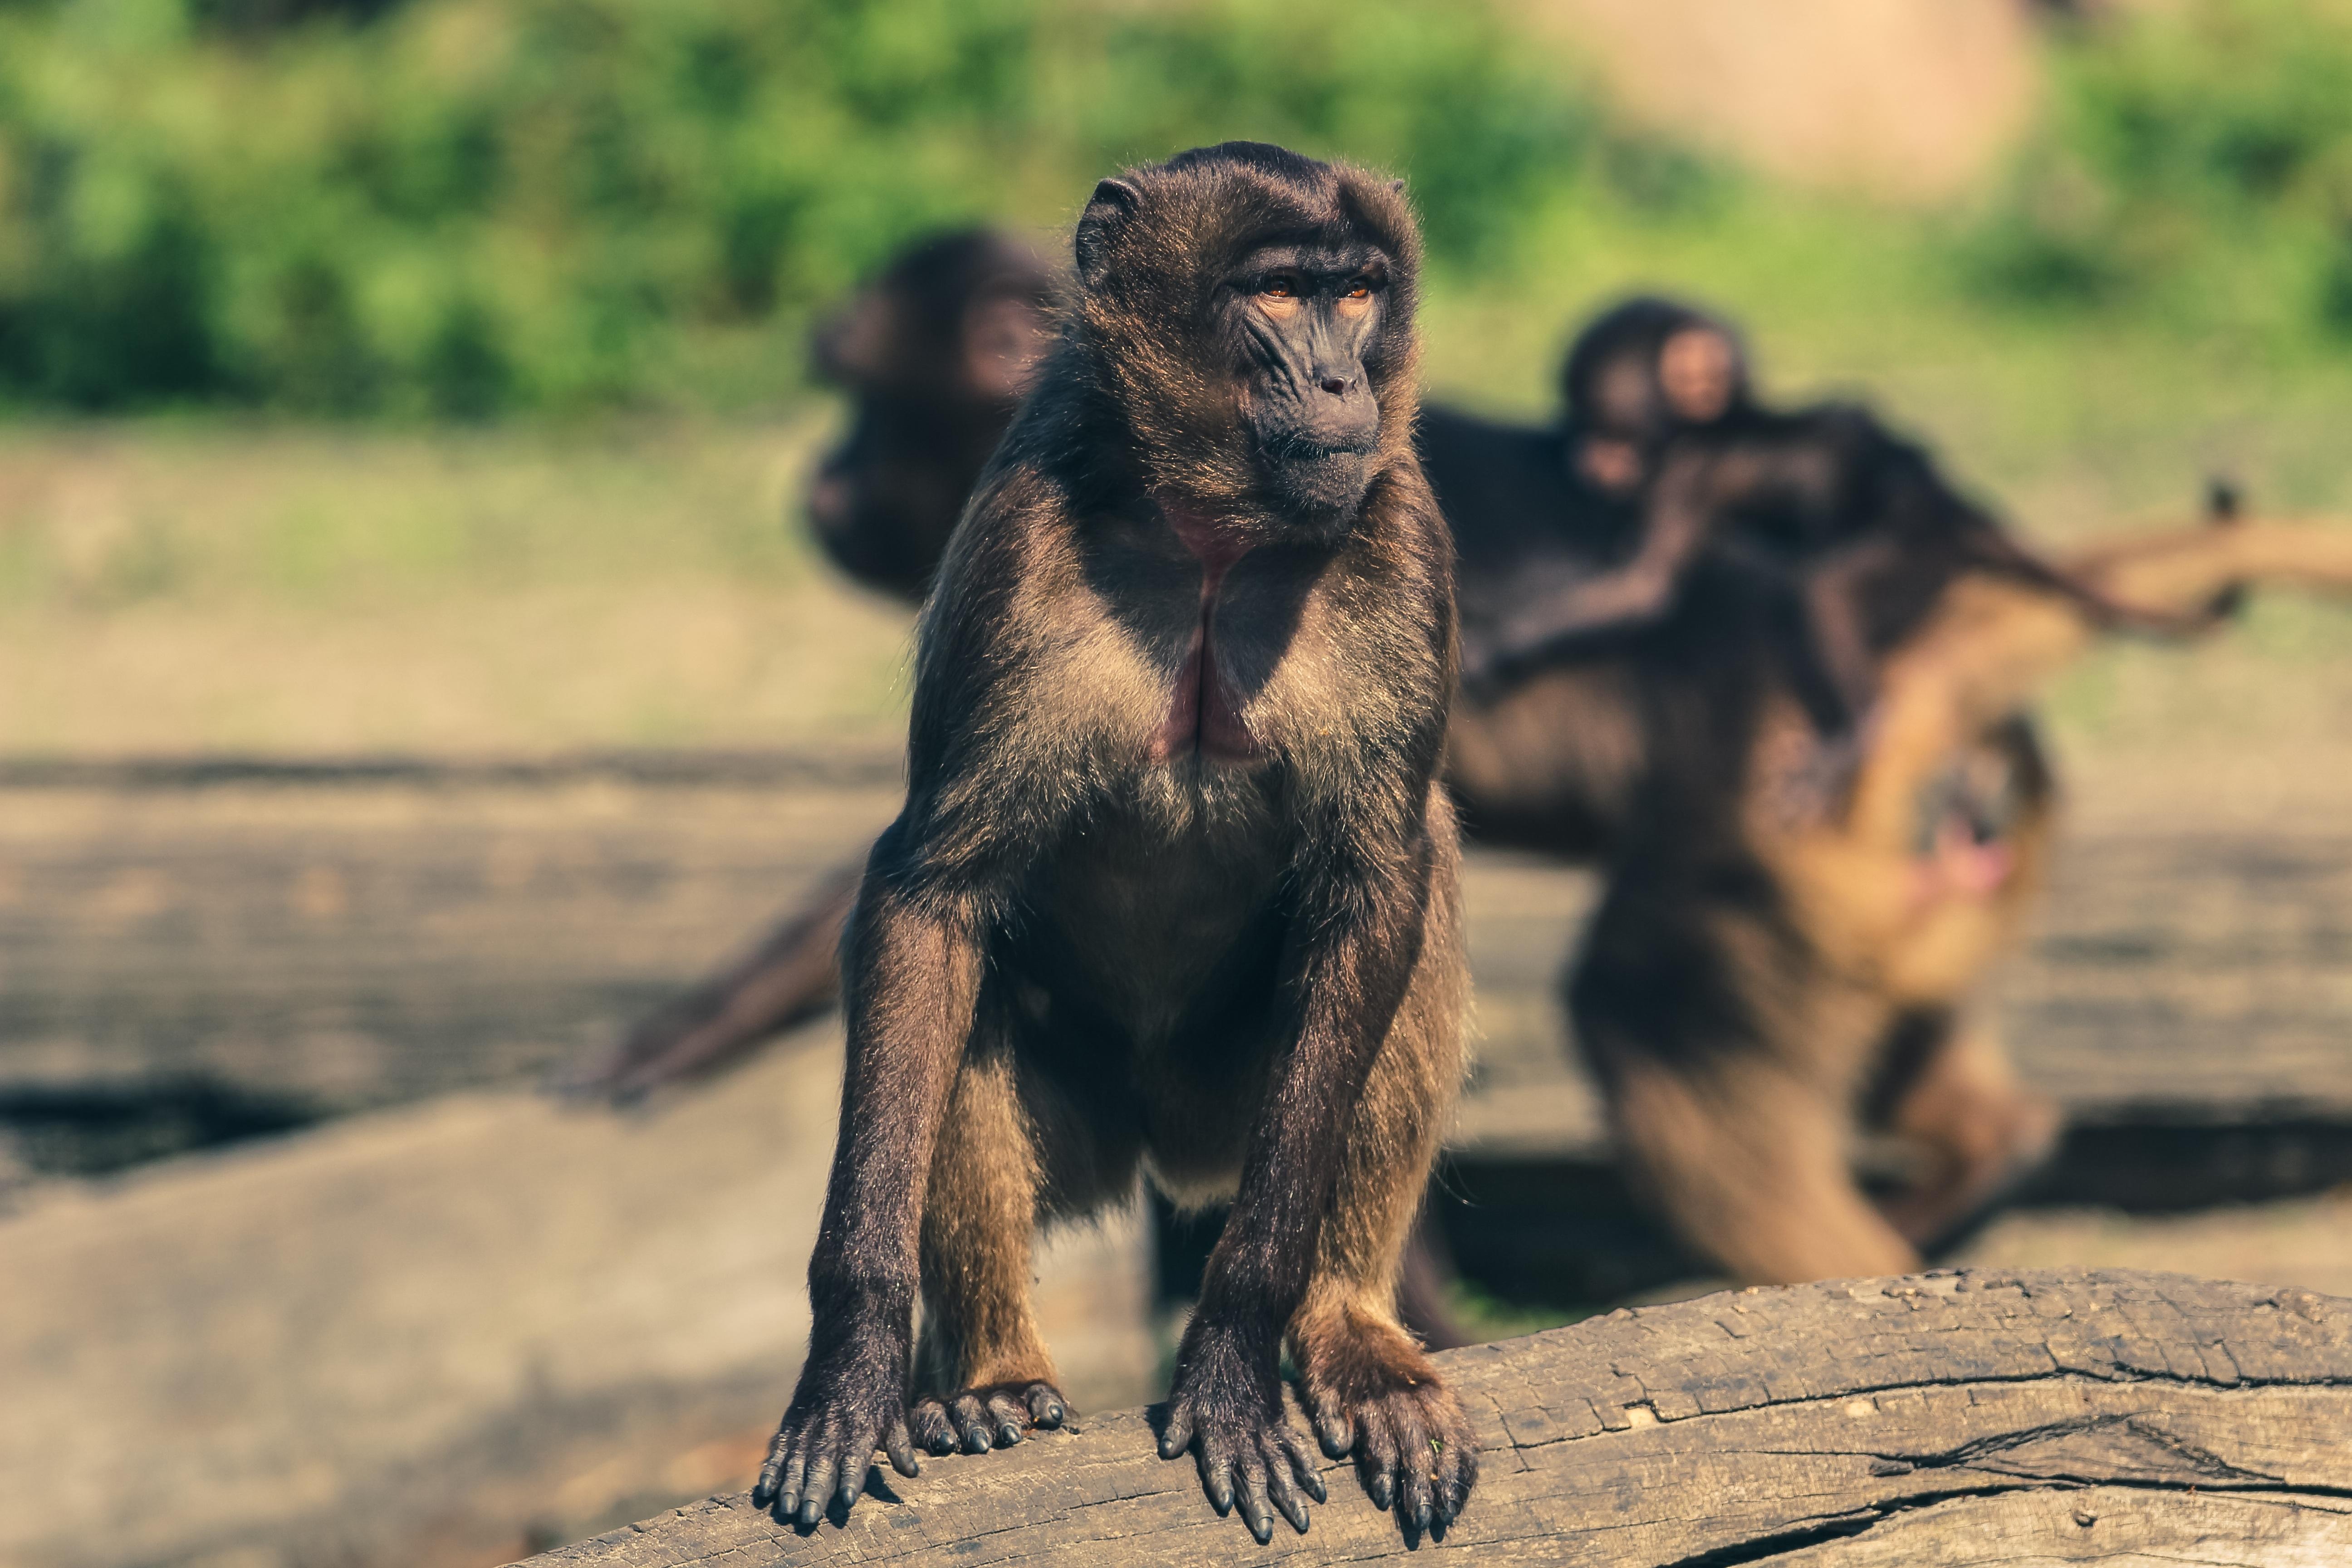 Monkey drug trials video motorcycle